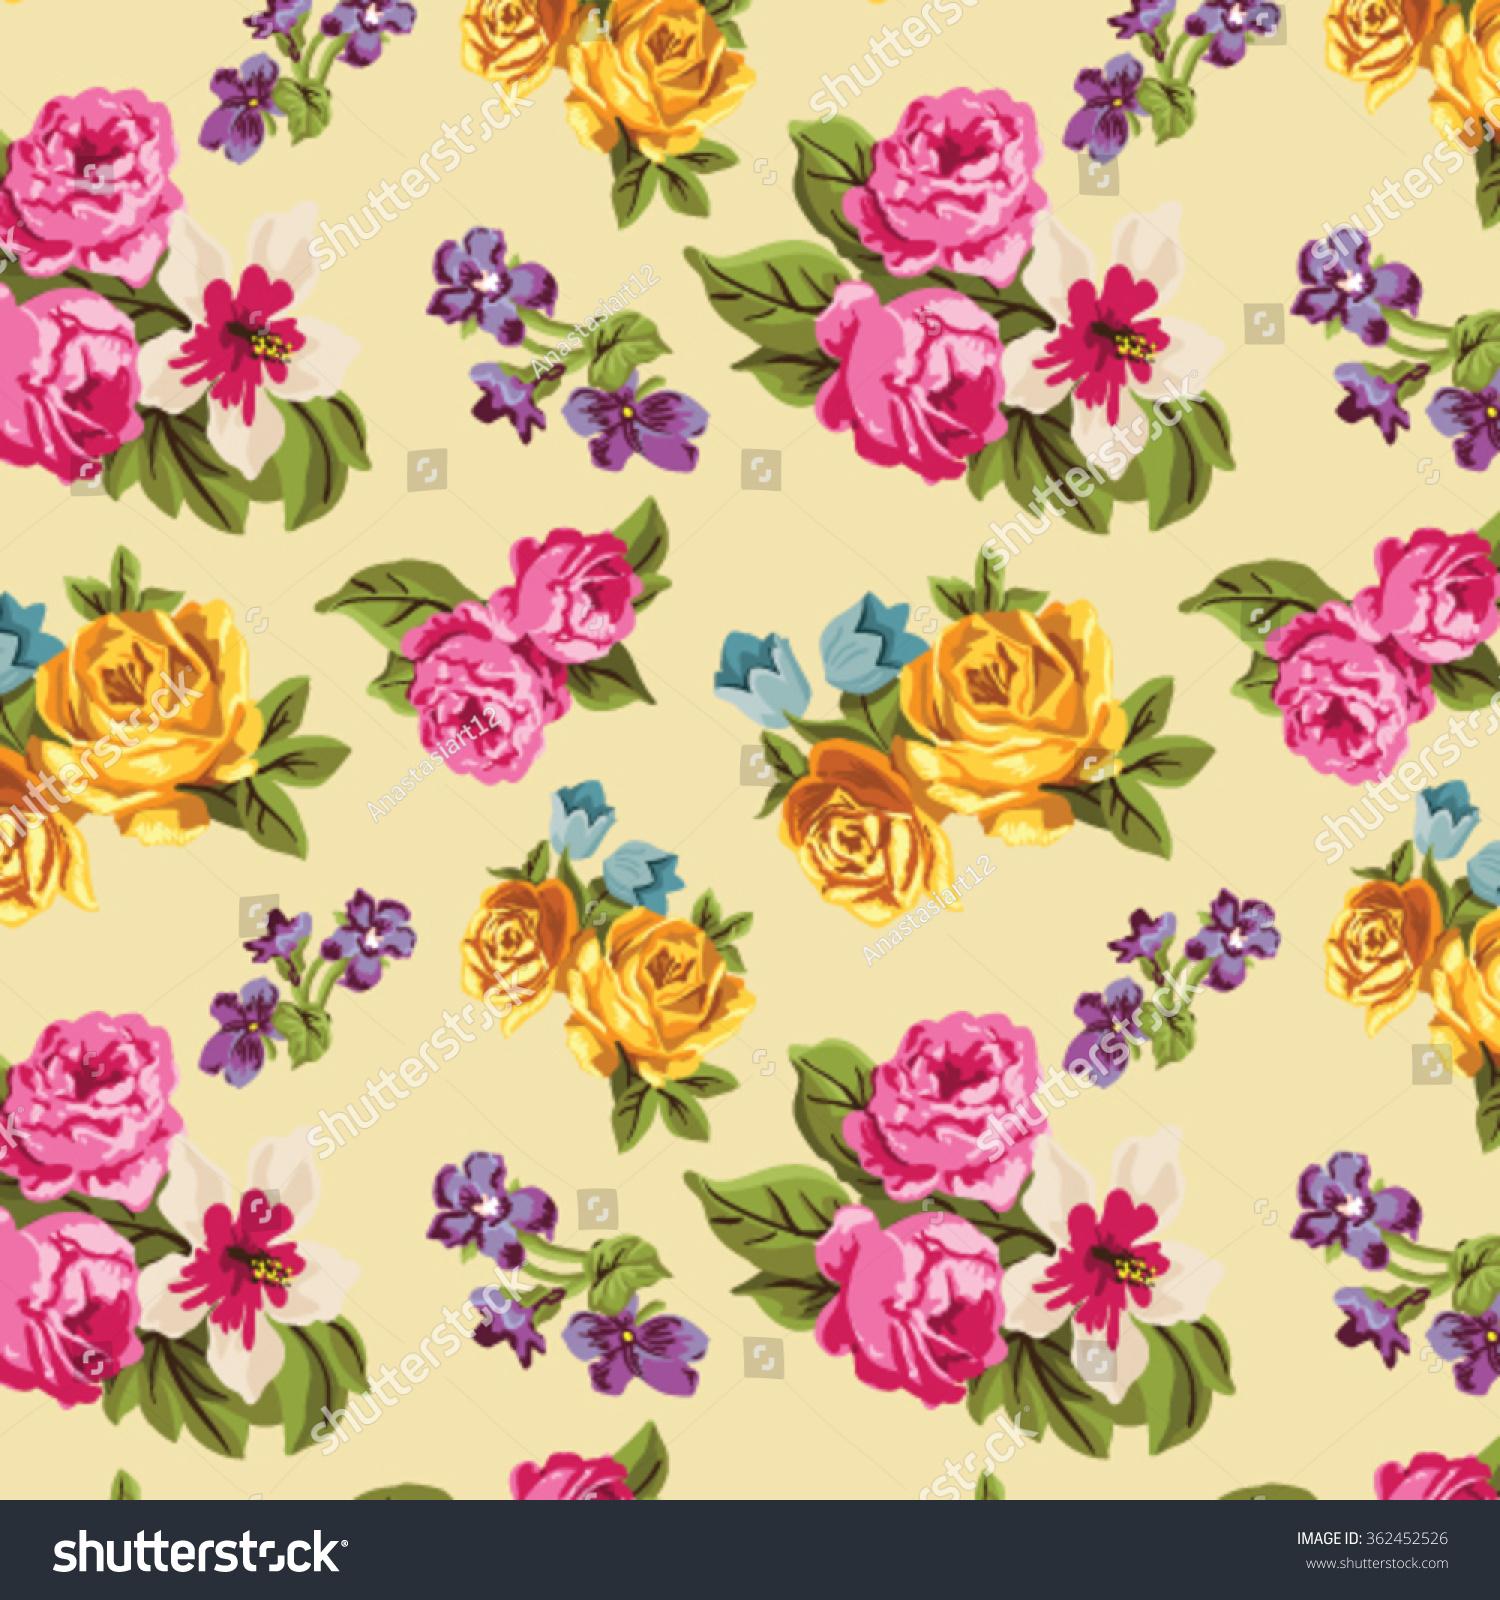 Seamless Retro Floral Wallpaper Stock Vector Royalty Free 362452526